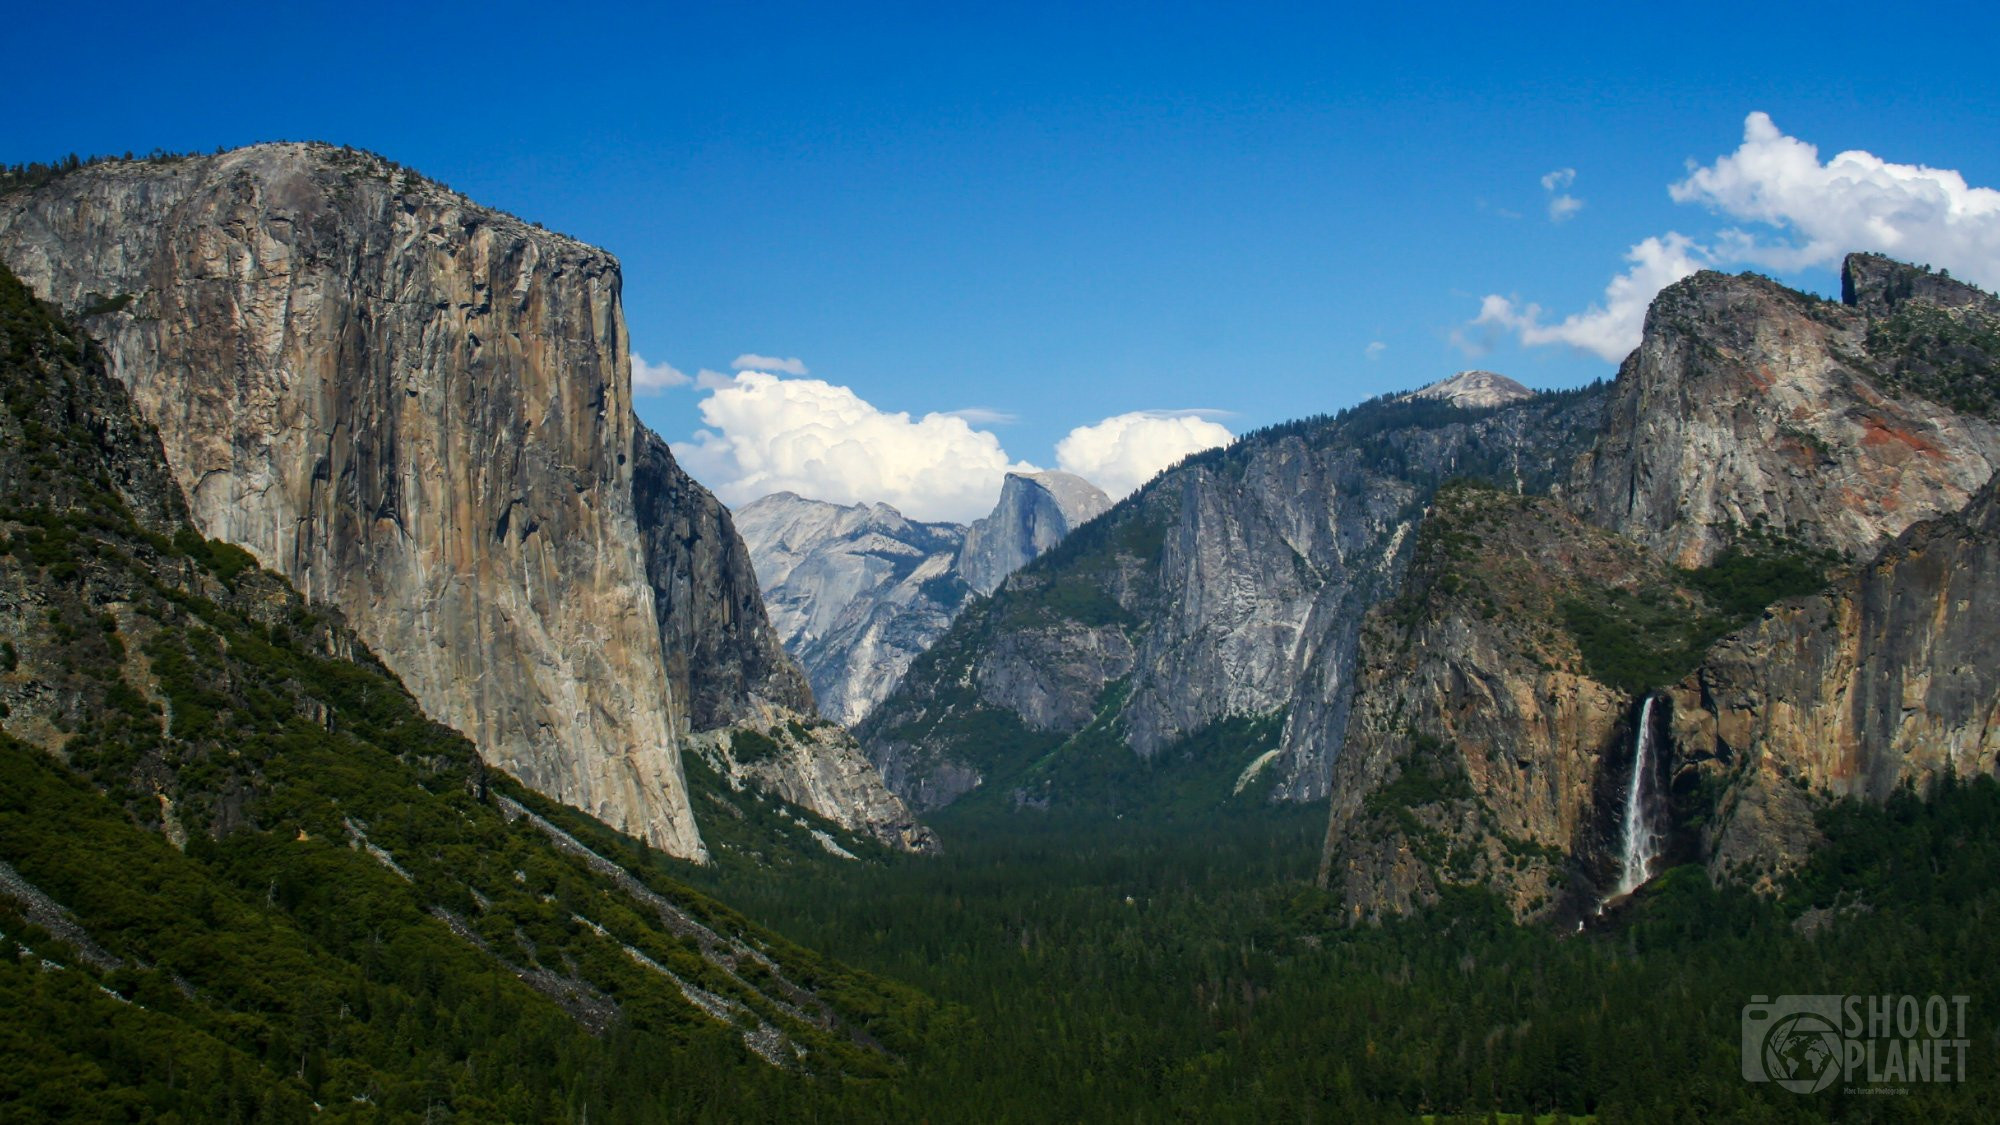 Yosemite National Park tunnel view panorama, California